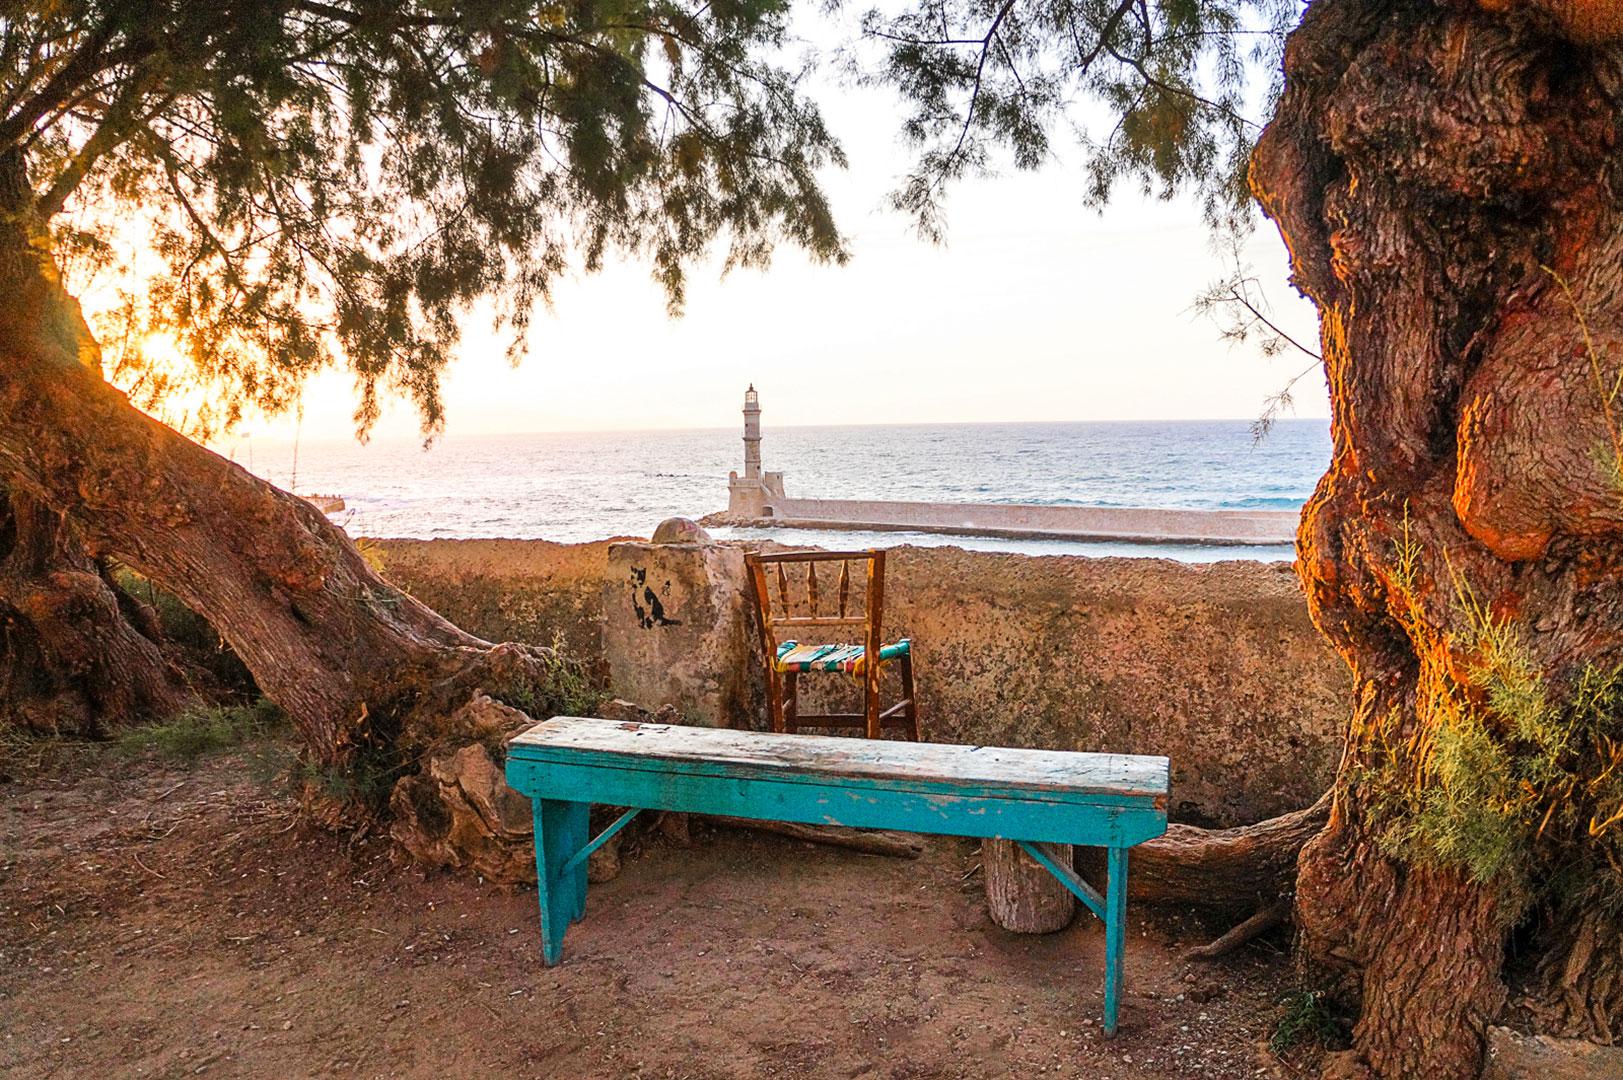 chania-crete-greece-la-vie-en-blog-all-rights-reserved-14